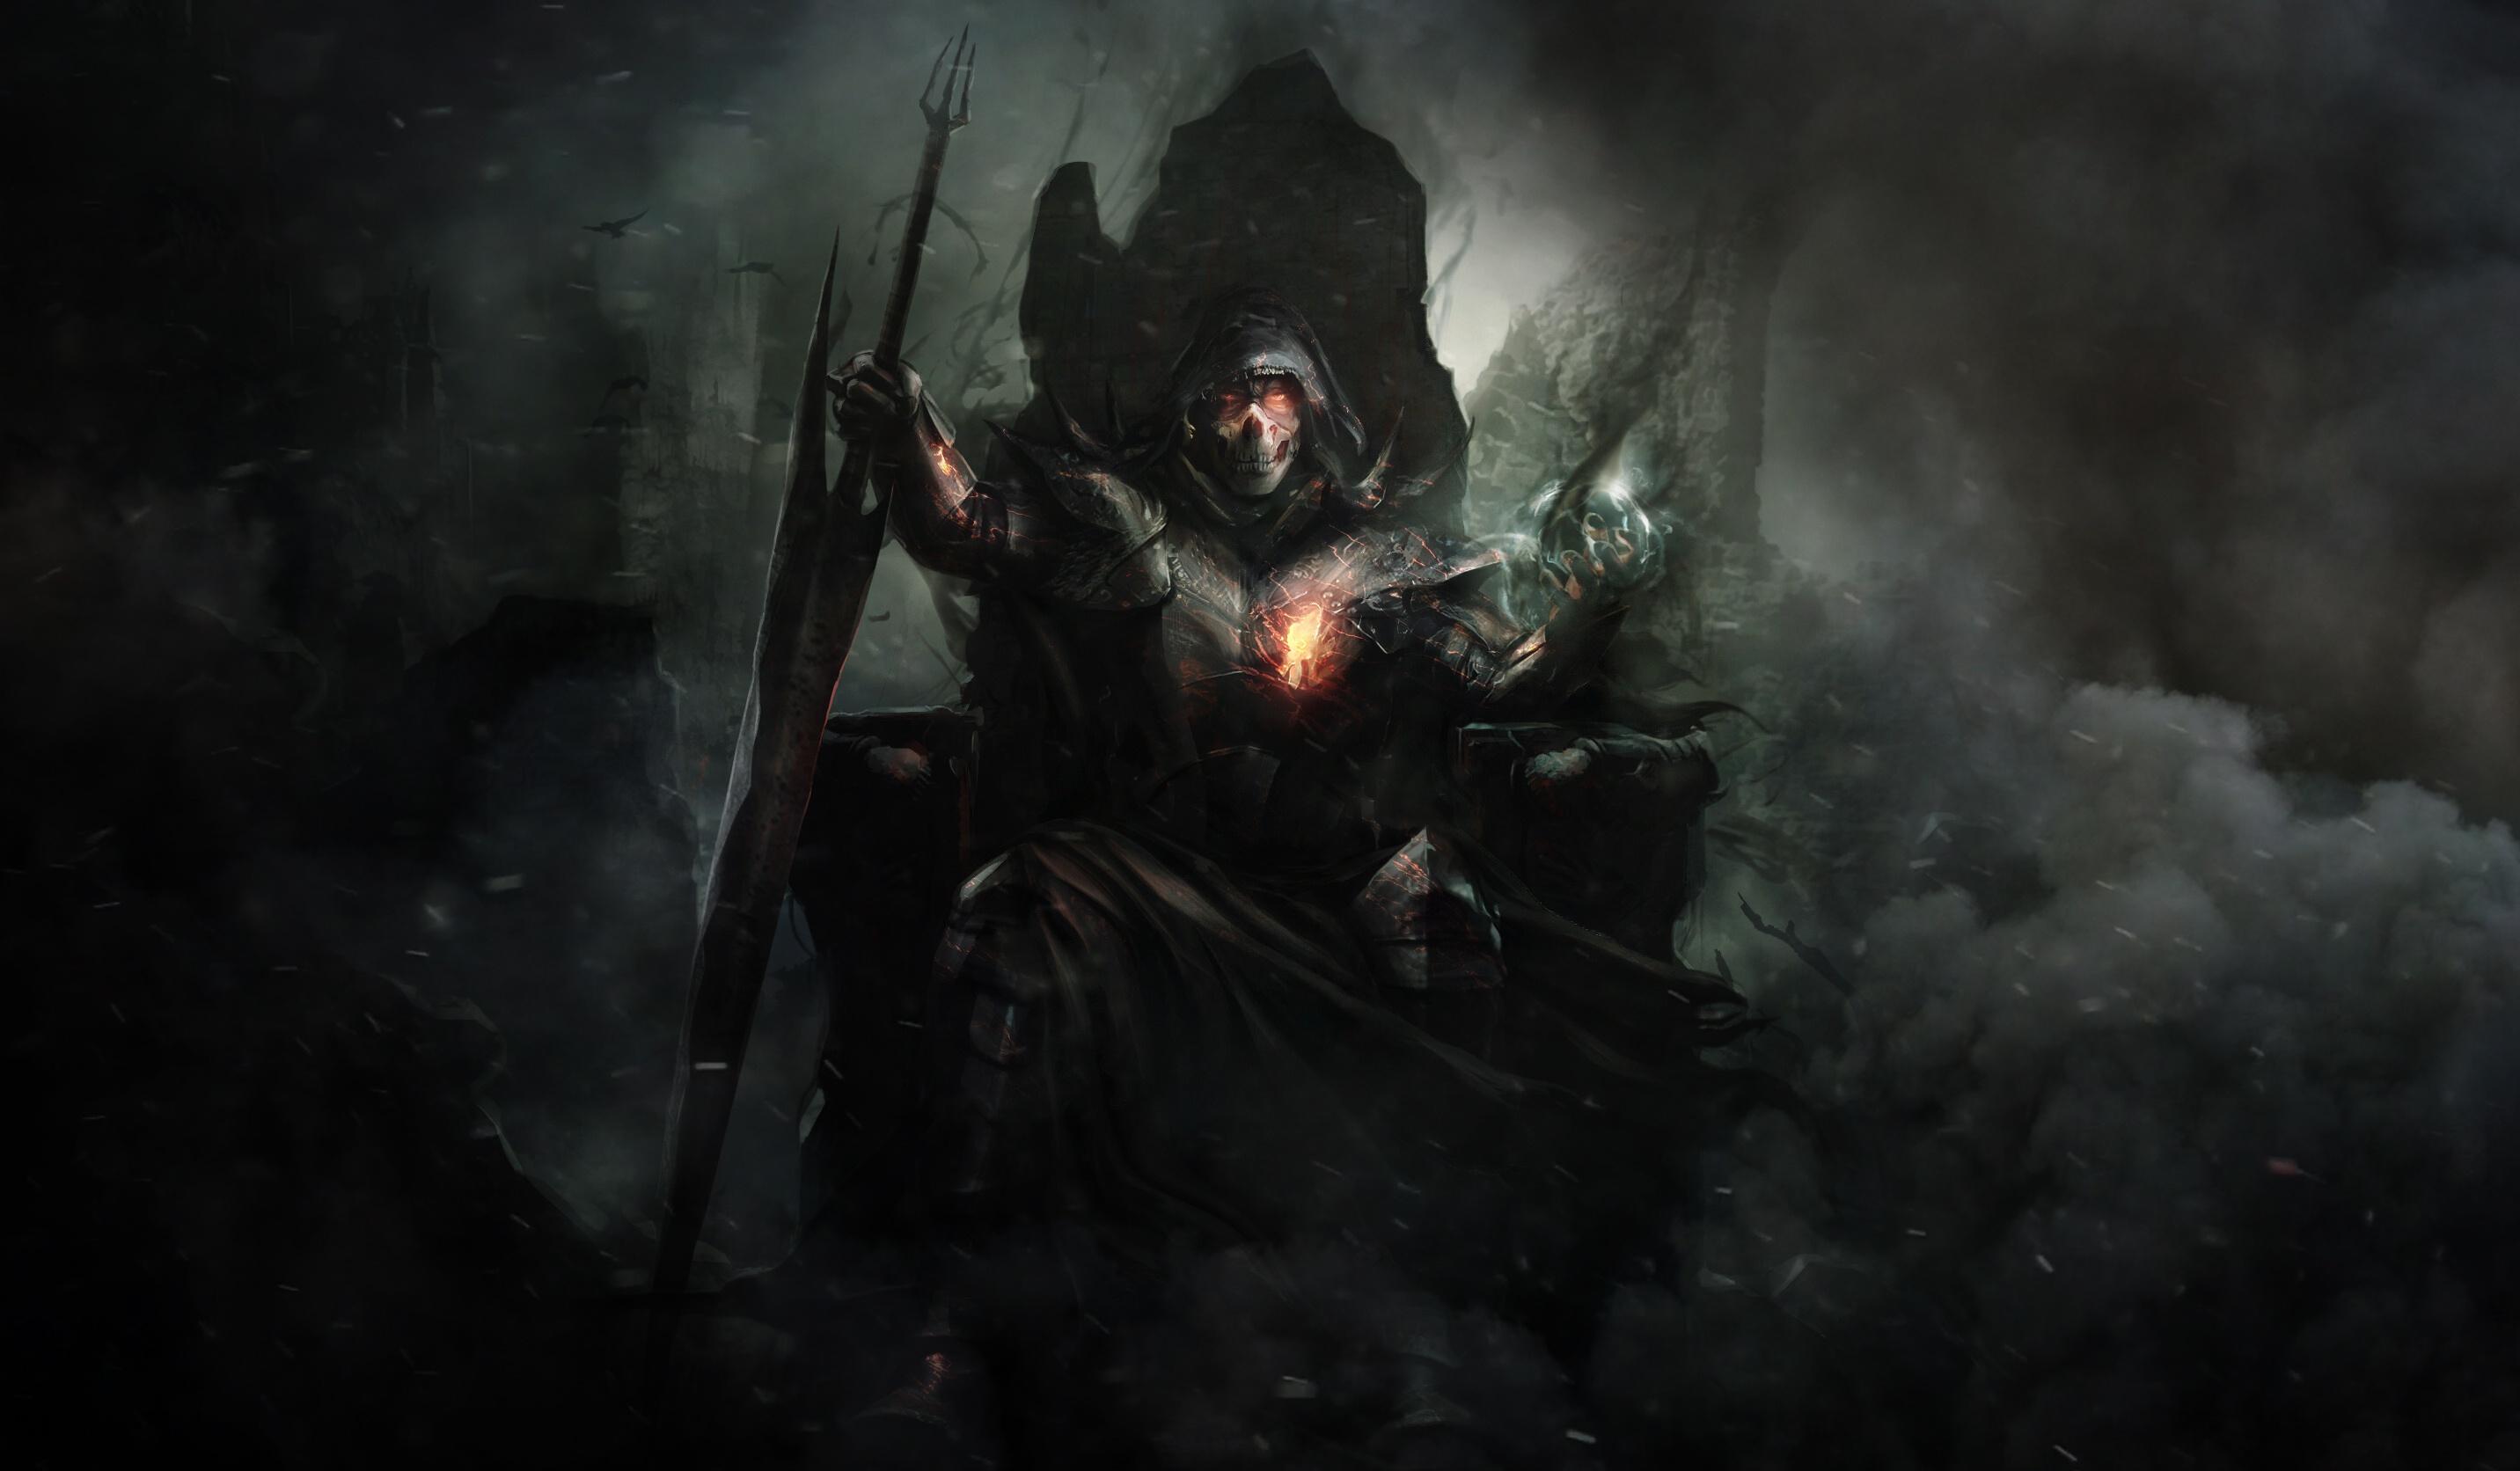 wallpaper dark artwork fantasy art demon 2864x1672